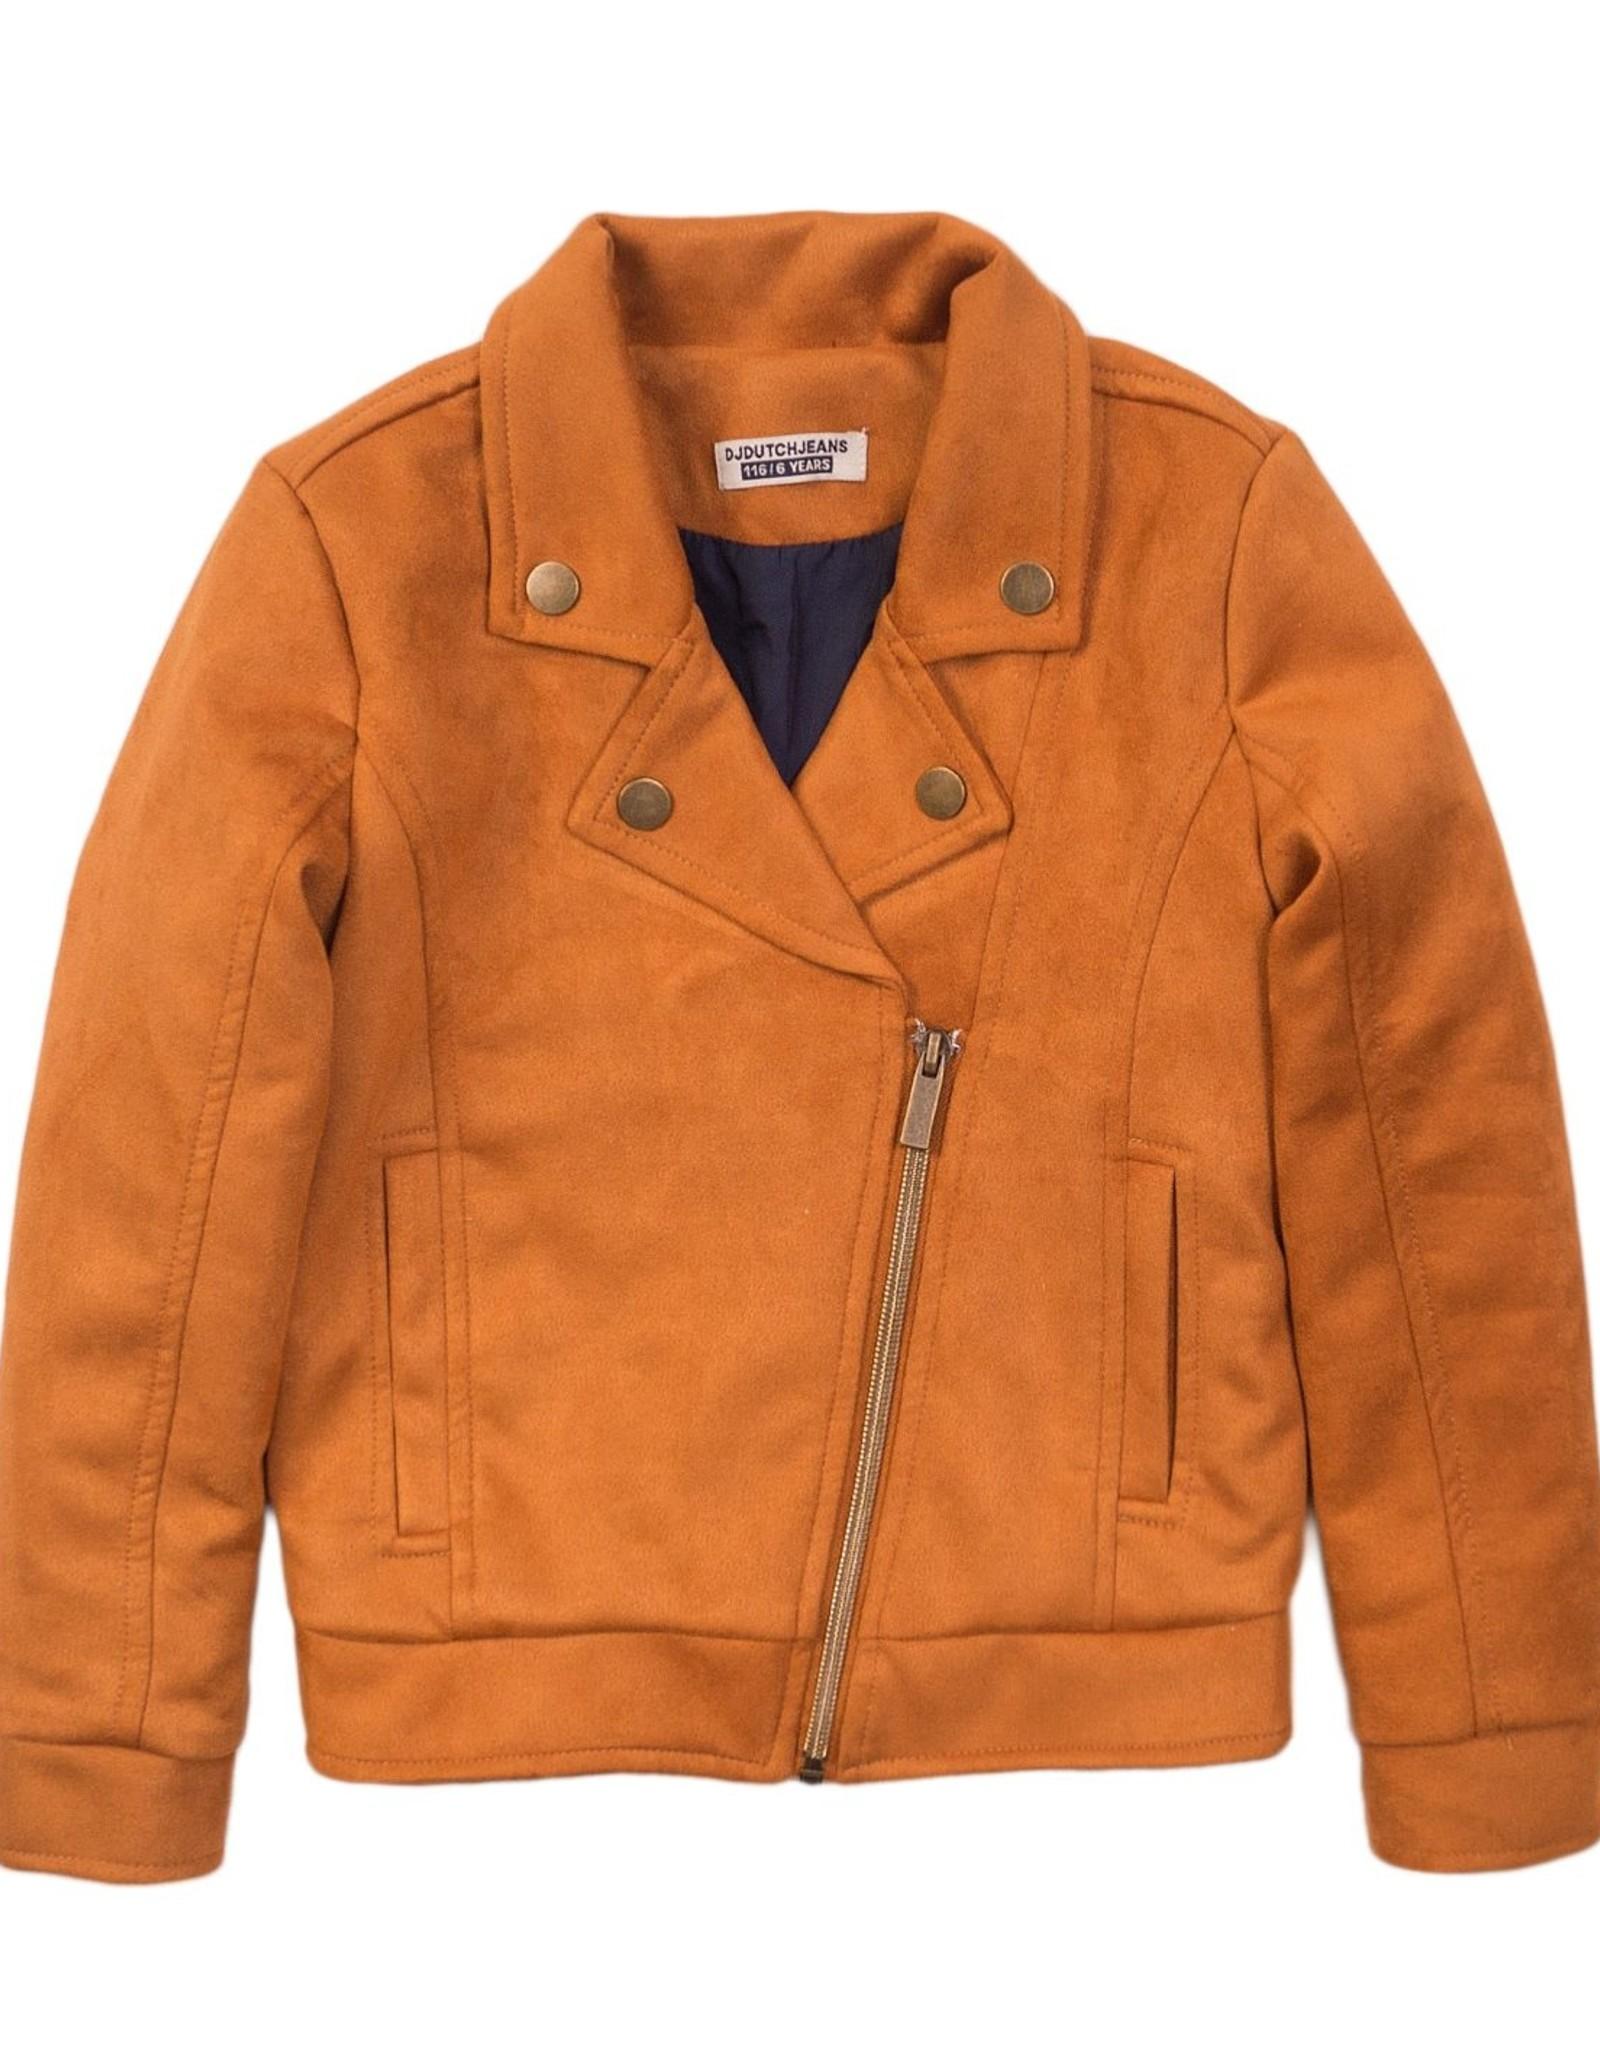 DJ Dutchjeans DJ Dutchjeans jacket 38041 camel